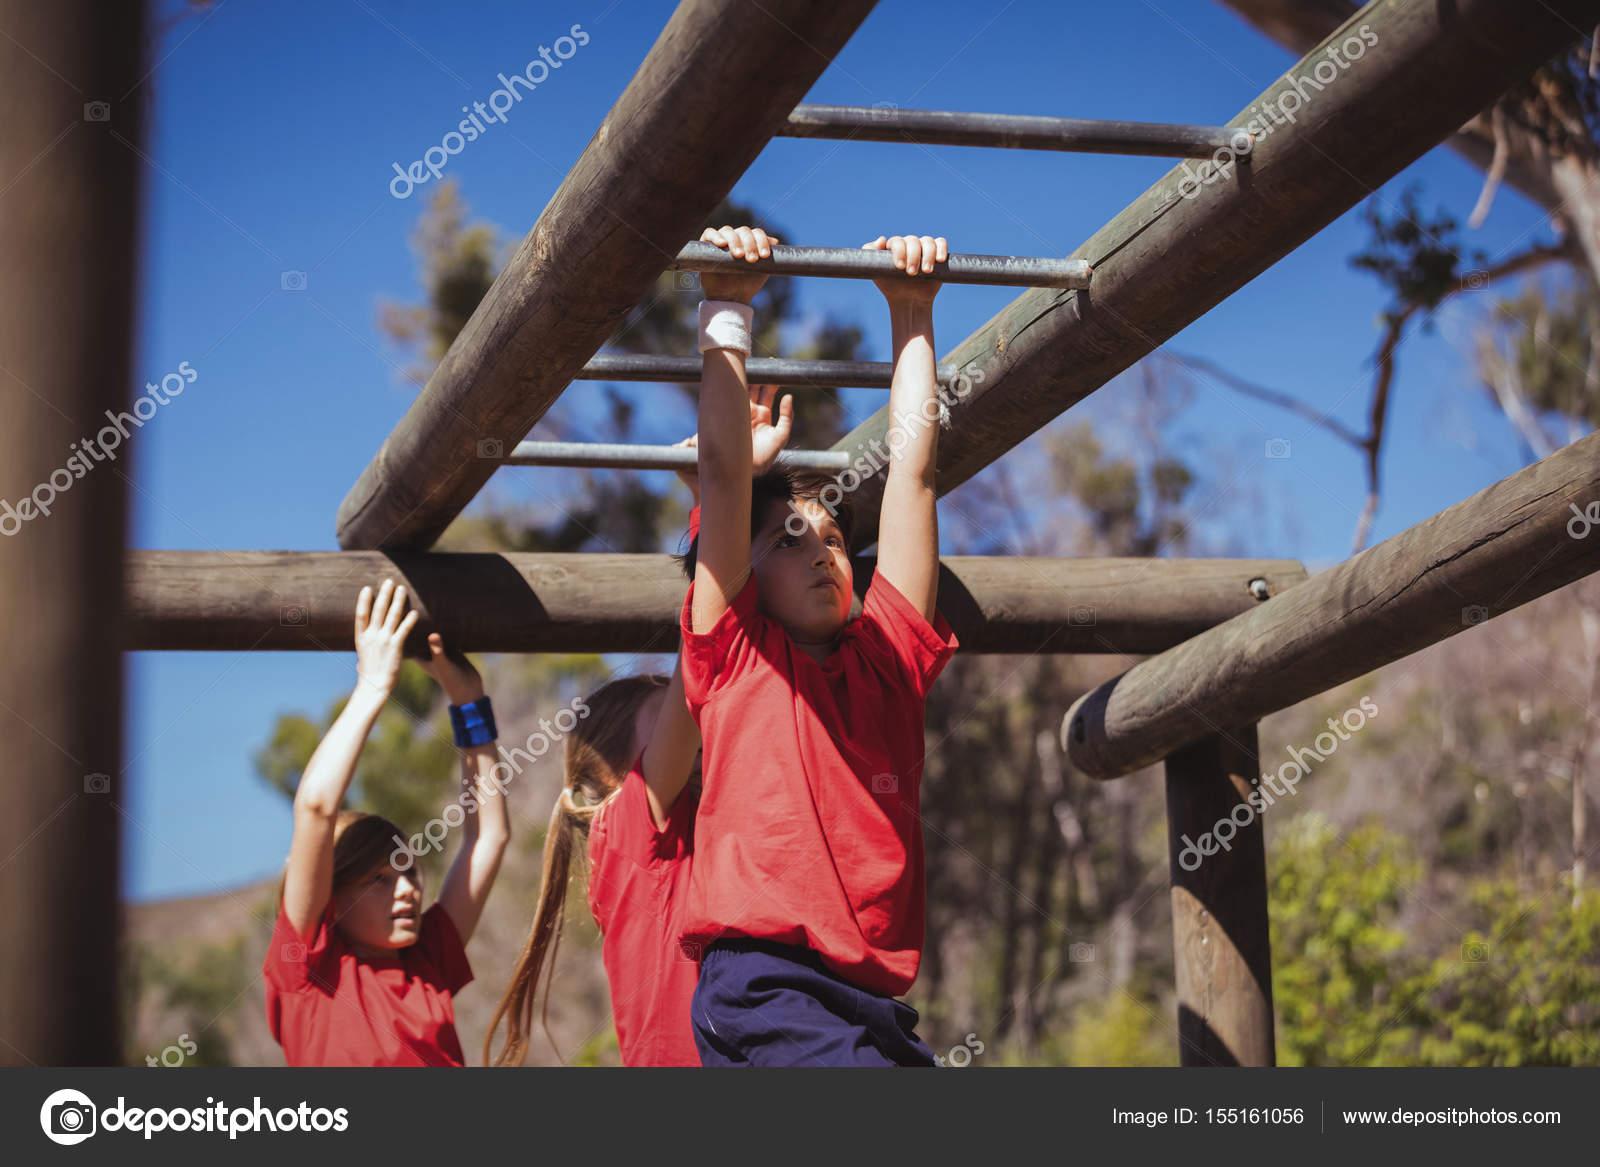 Klettergerüst Monkey Bar Gebraucht : Kinder klettern klettergerüst u stockfoto wavebreakmedia